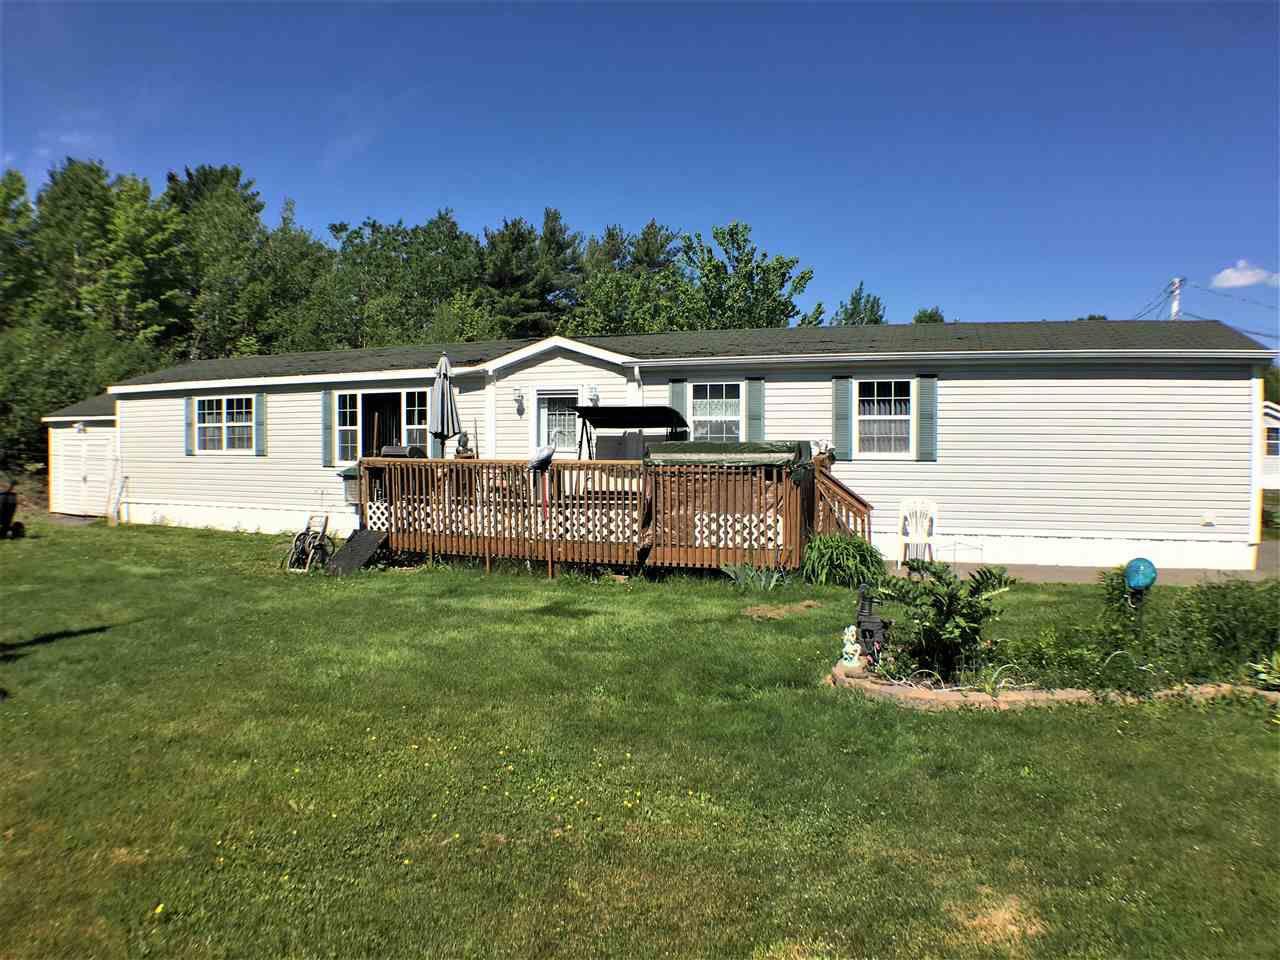 Main Photo: 1105 Park Lane in Westville: 107-Trenton,Westville,Pictou Residential for sale (Northern Region)  : MLS®# 201914673